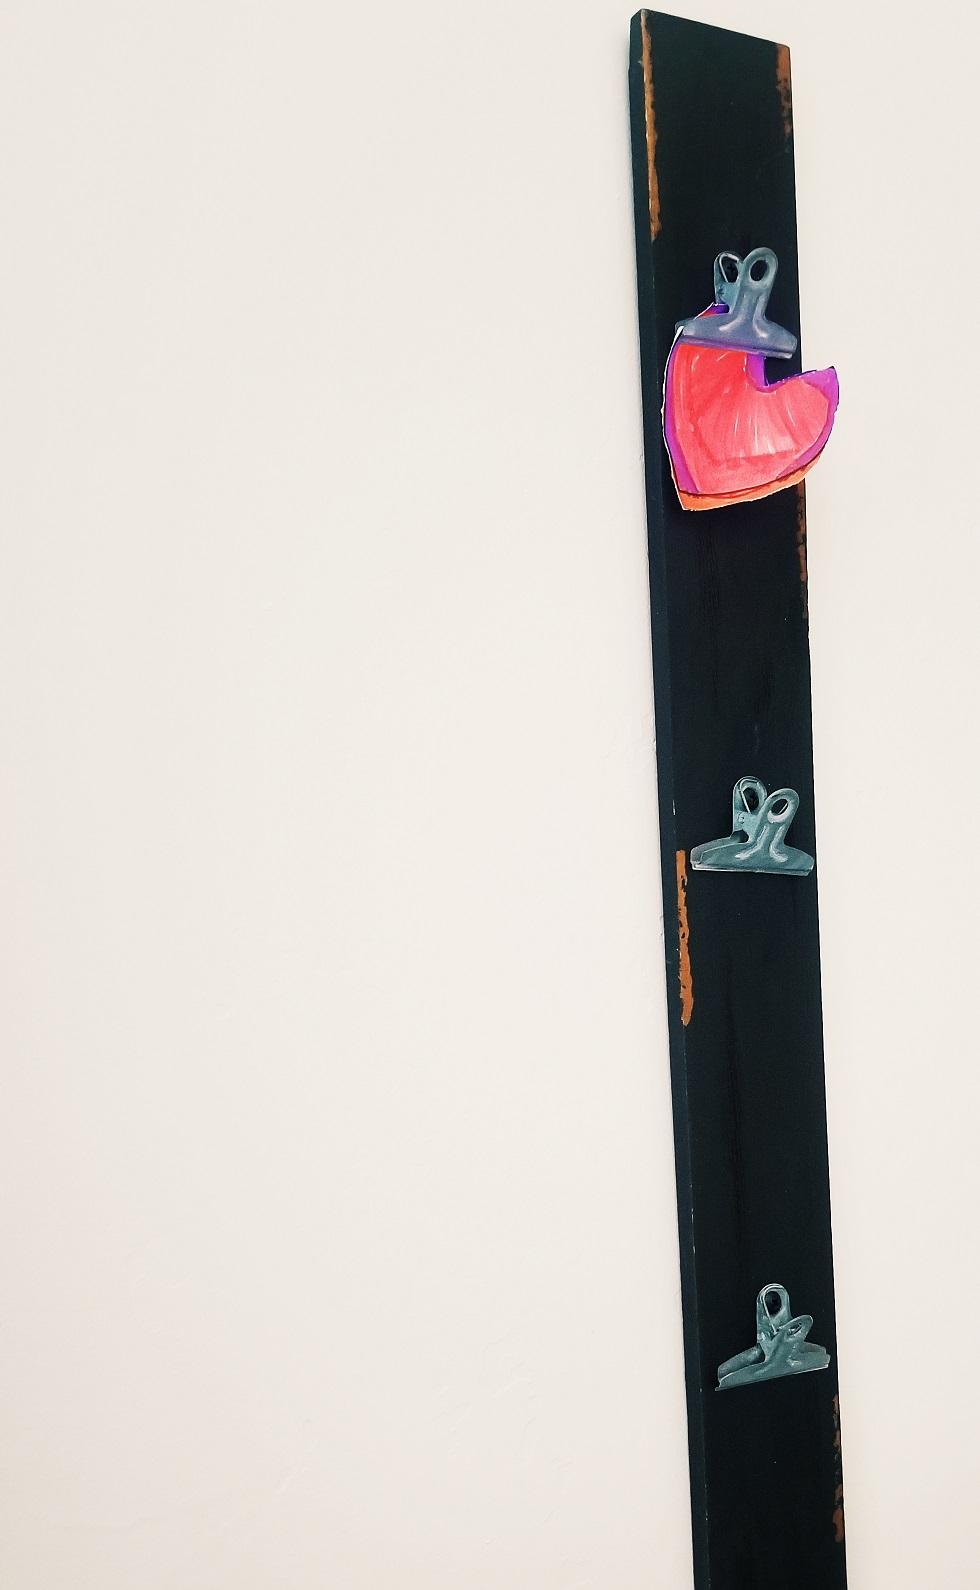 clip hanger for displaying kid arwork